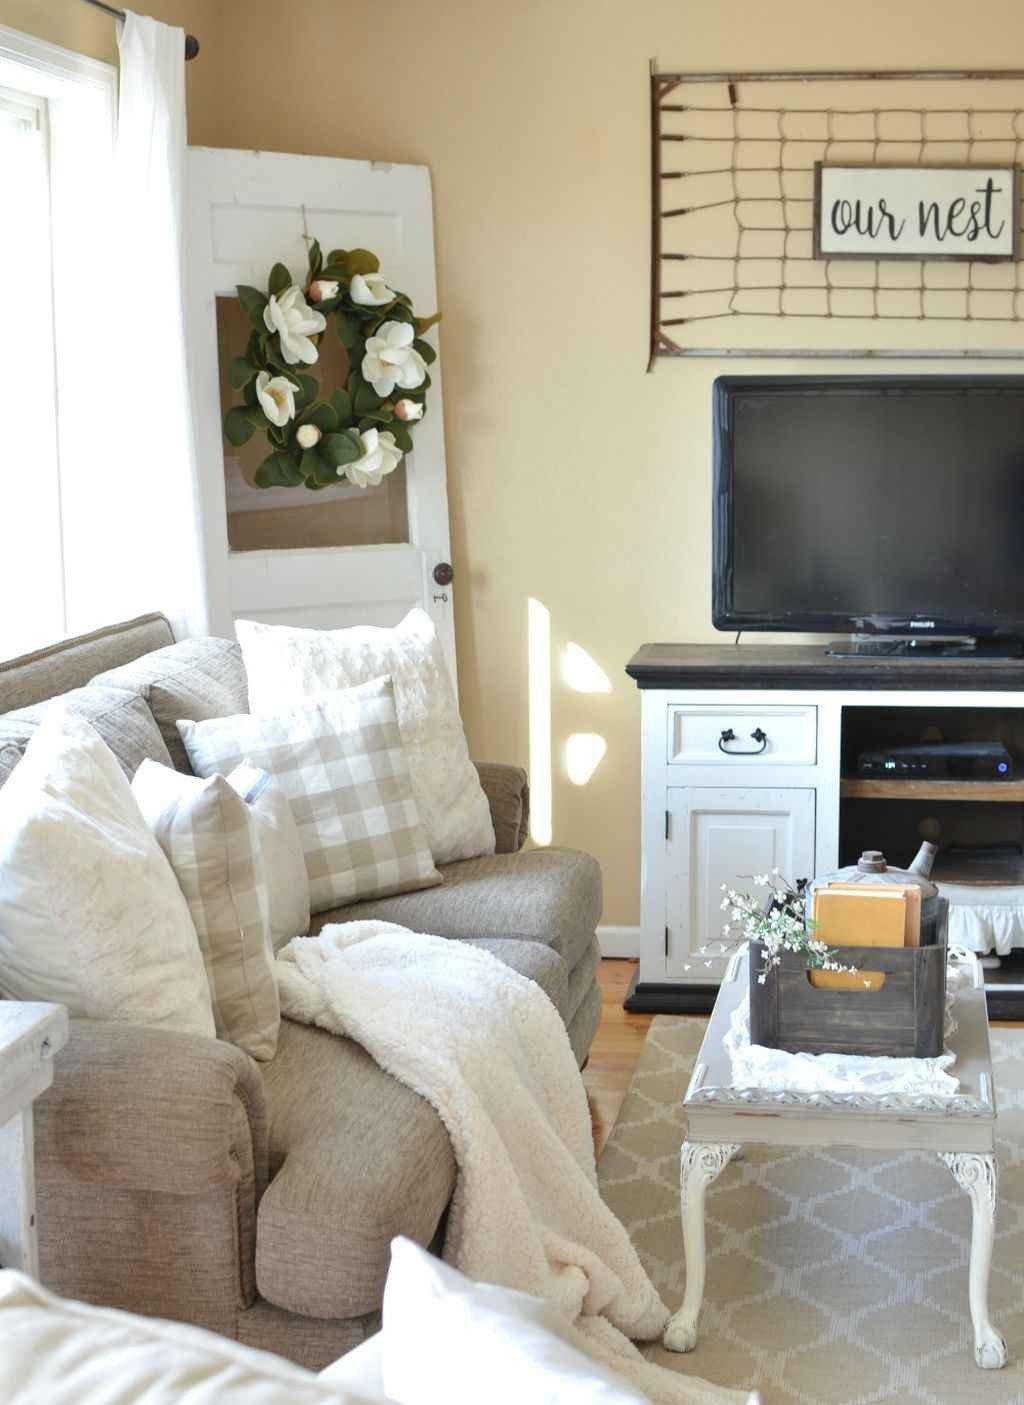 Modern Farmhouse Living Room Decorating Ideas Awesome 50 Cozy Modern Farmhouse Living Room Decorating Ideas Architeworks